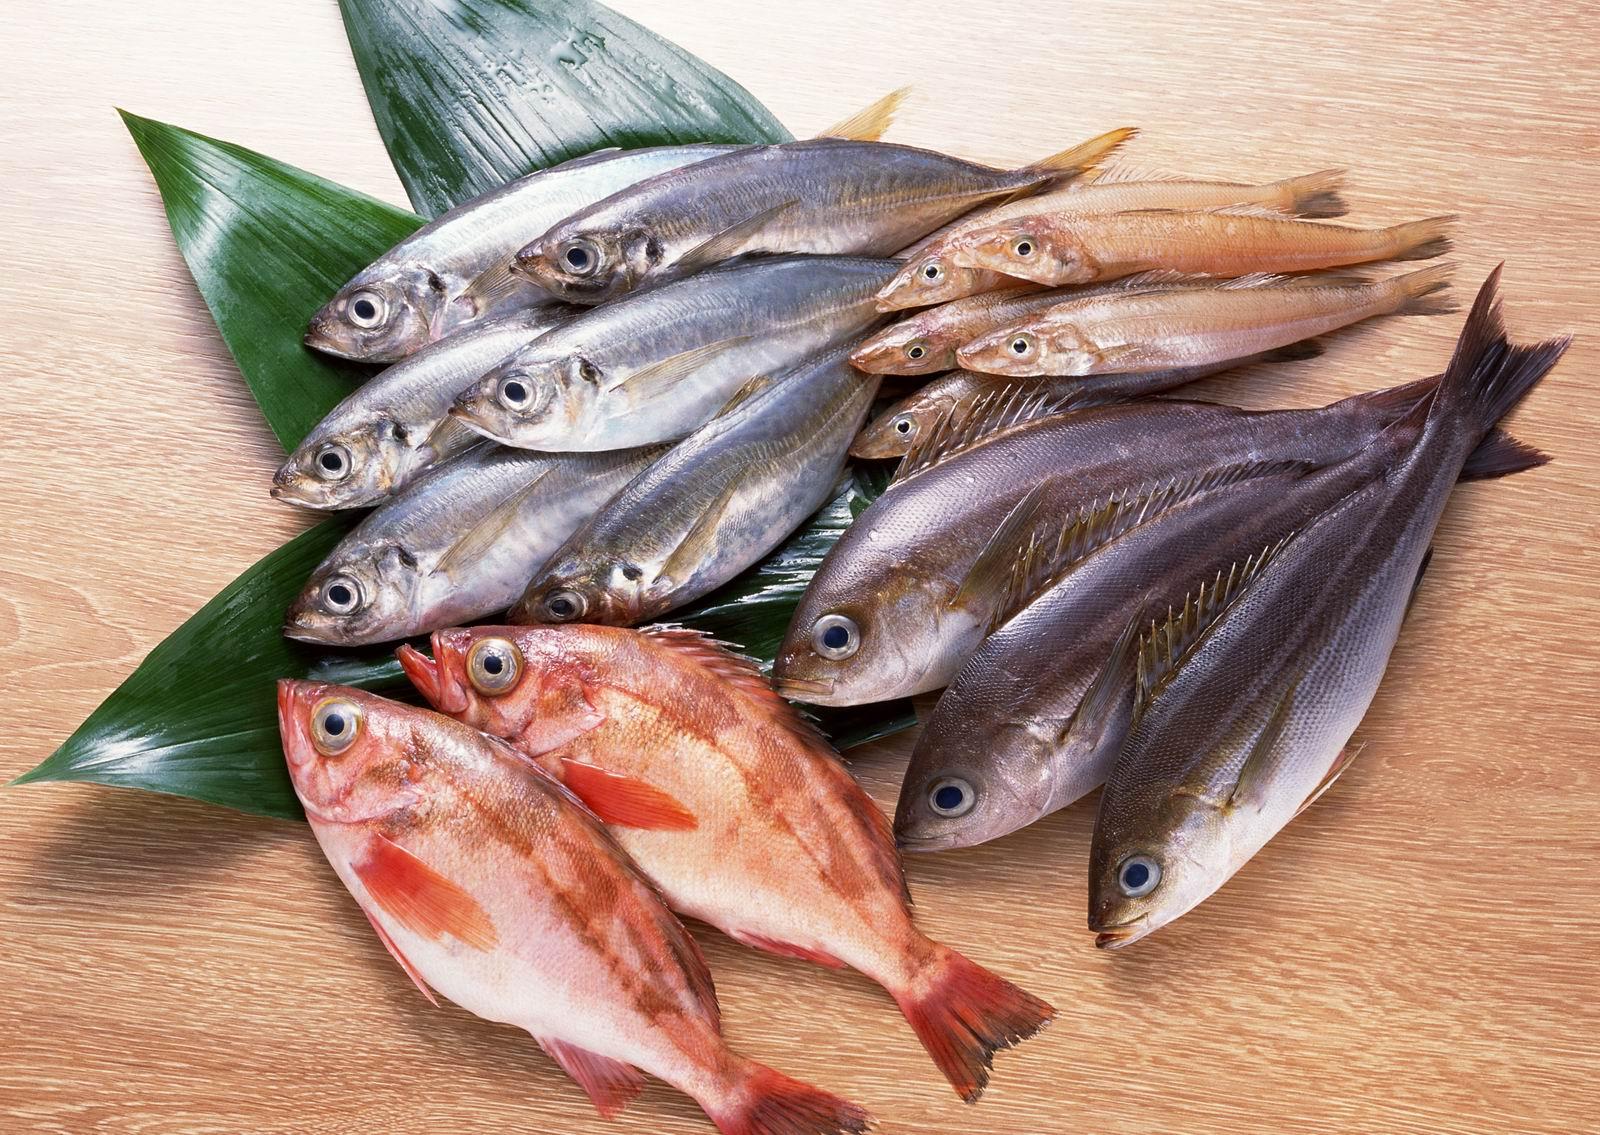 Sì al pesce, ma attenzione ai contaminanti!